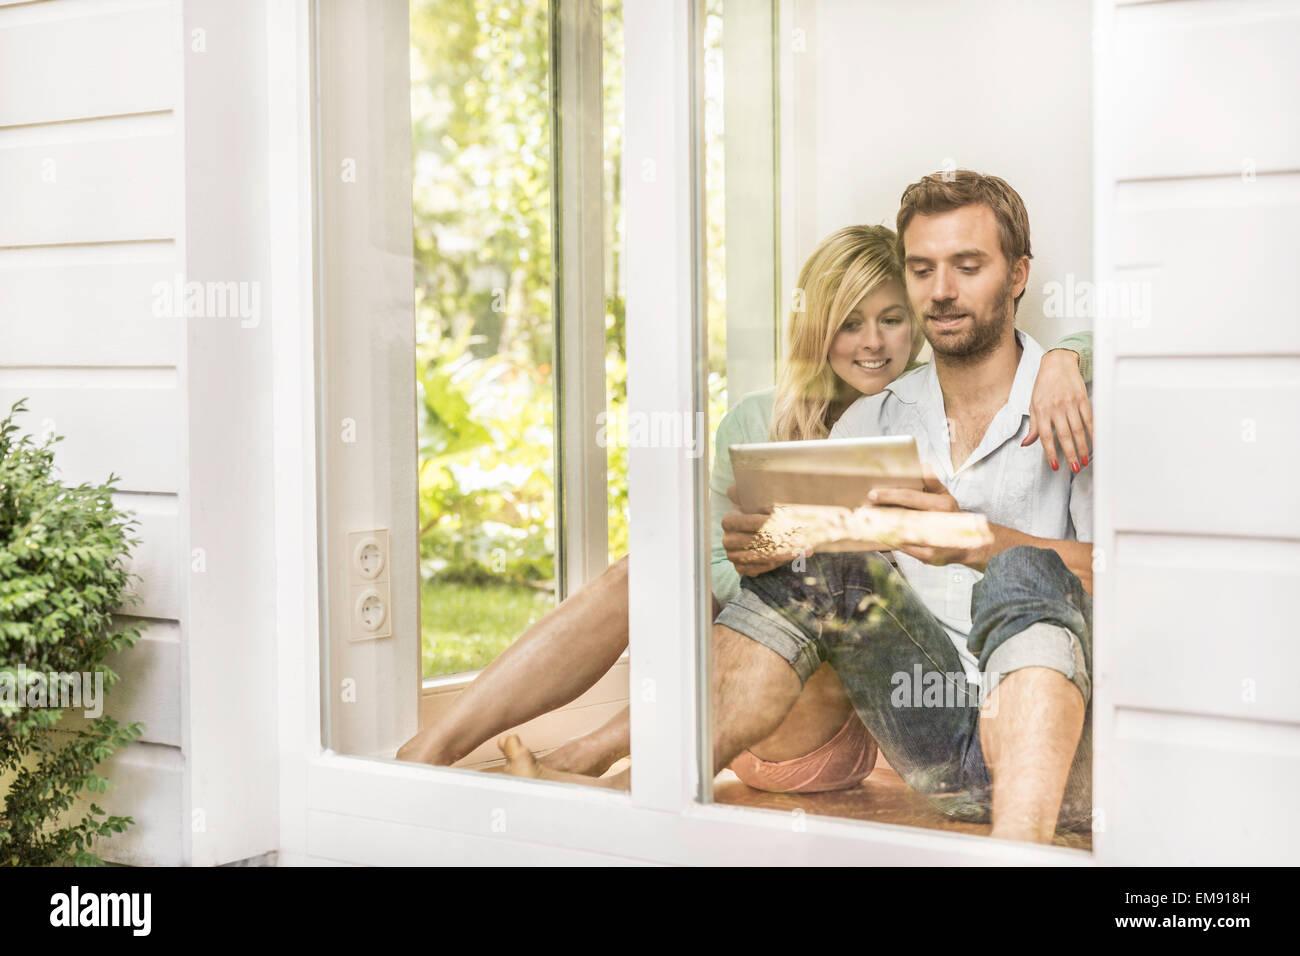 Mid adult couple sitting on floor using digital tablet at house window - Stock Image